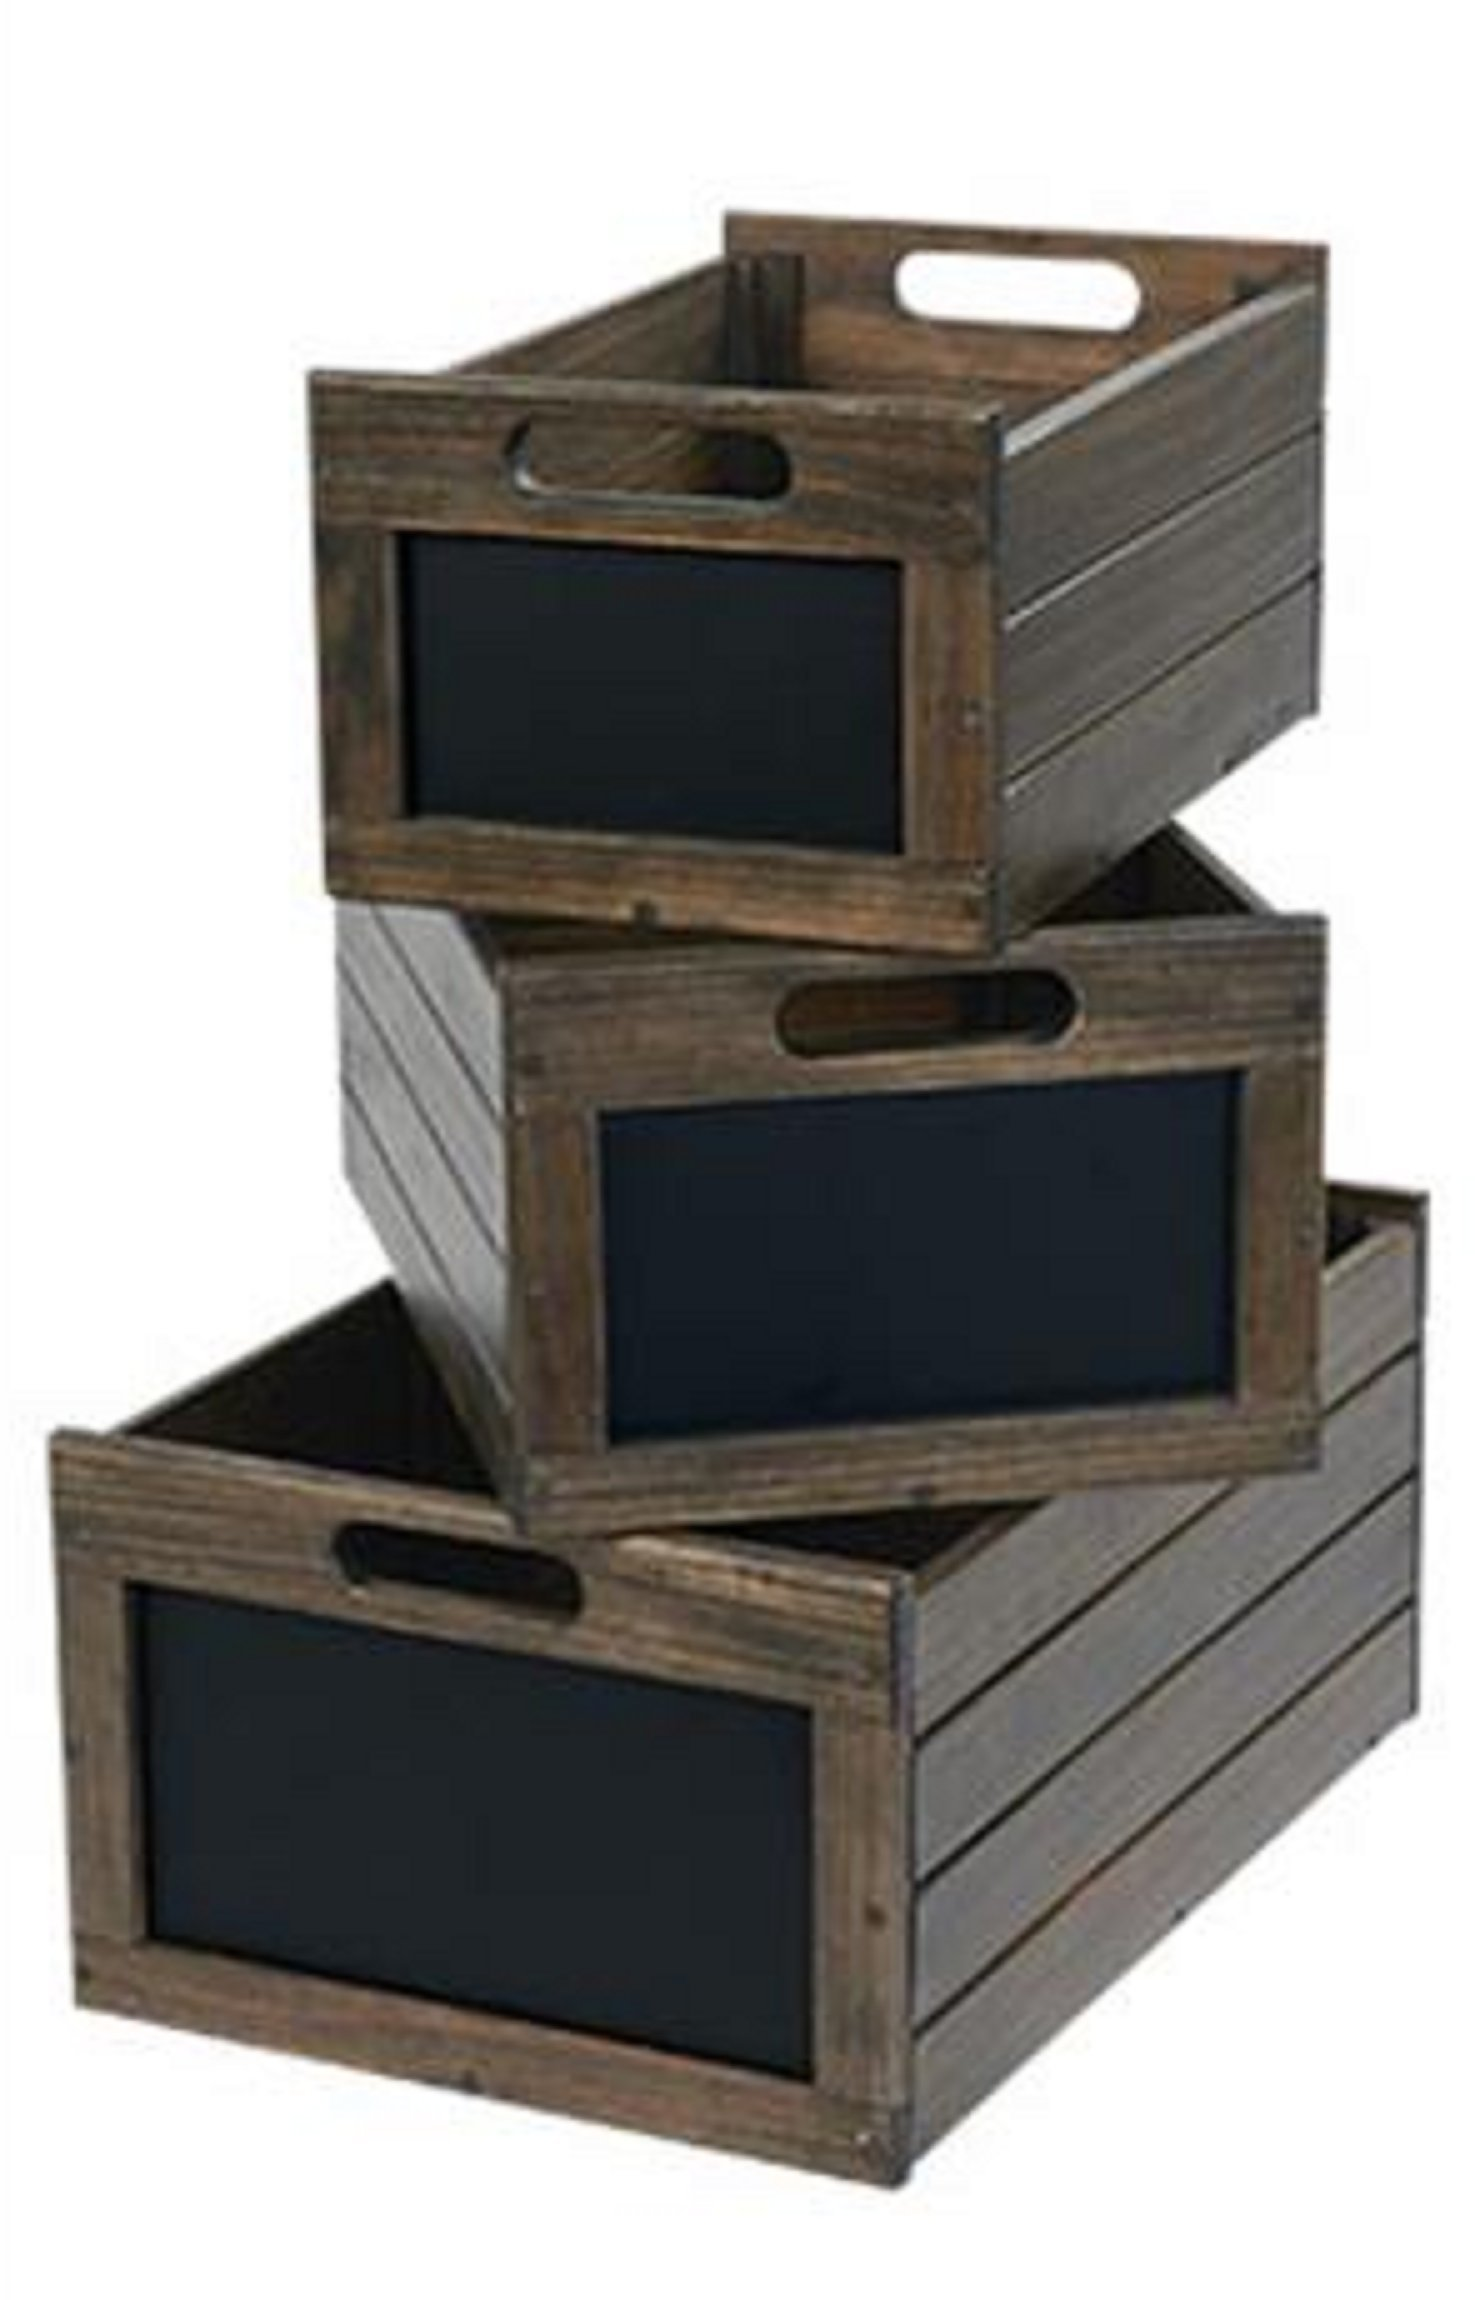 Wooden Storage Crates Bin Vegetable Potato Craft Nesting Box Oak Chalkboard Erasable Front Sign Label Set of 3 Produce Merchandise Display